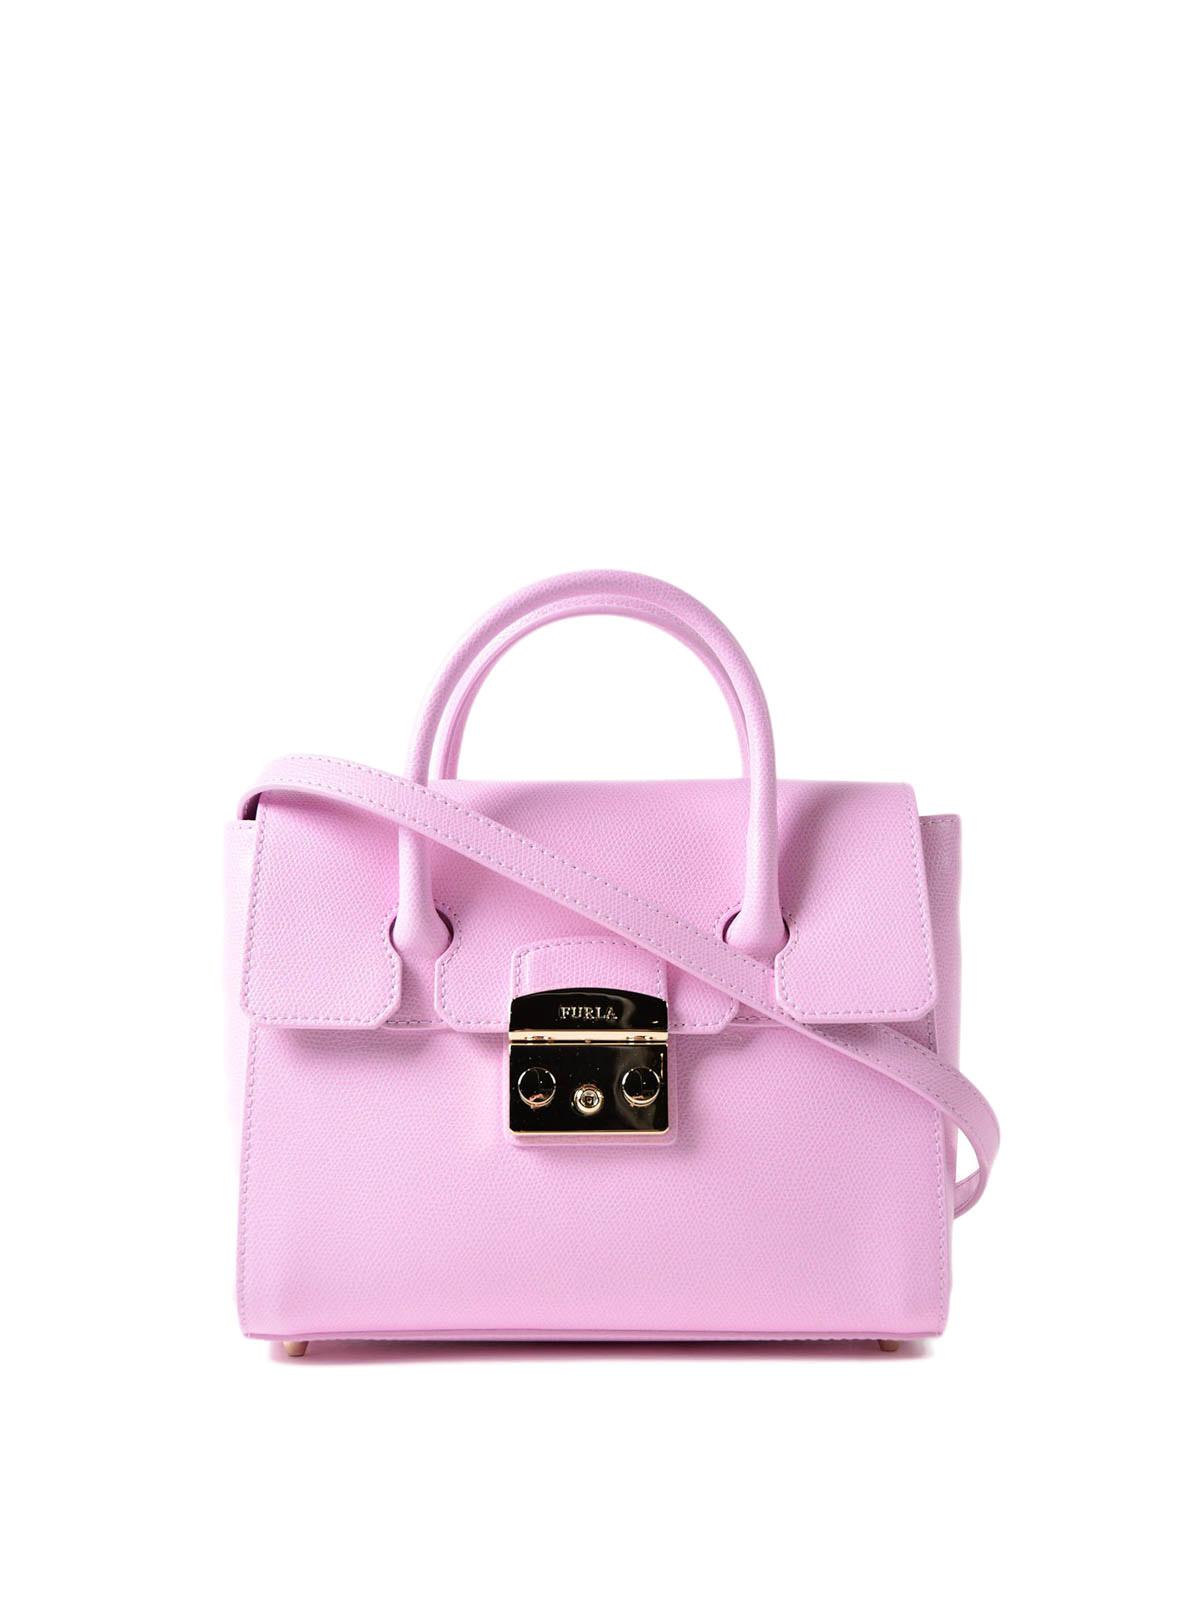 Furla - Metropolis S pink leather satchel - bowling bags - 928929 742c829898ab6